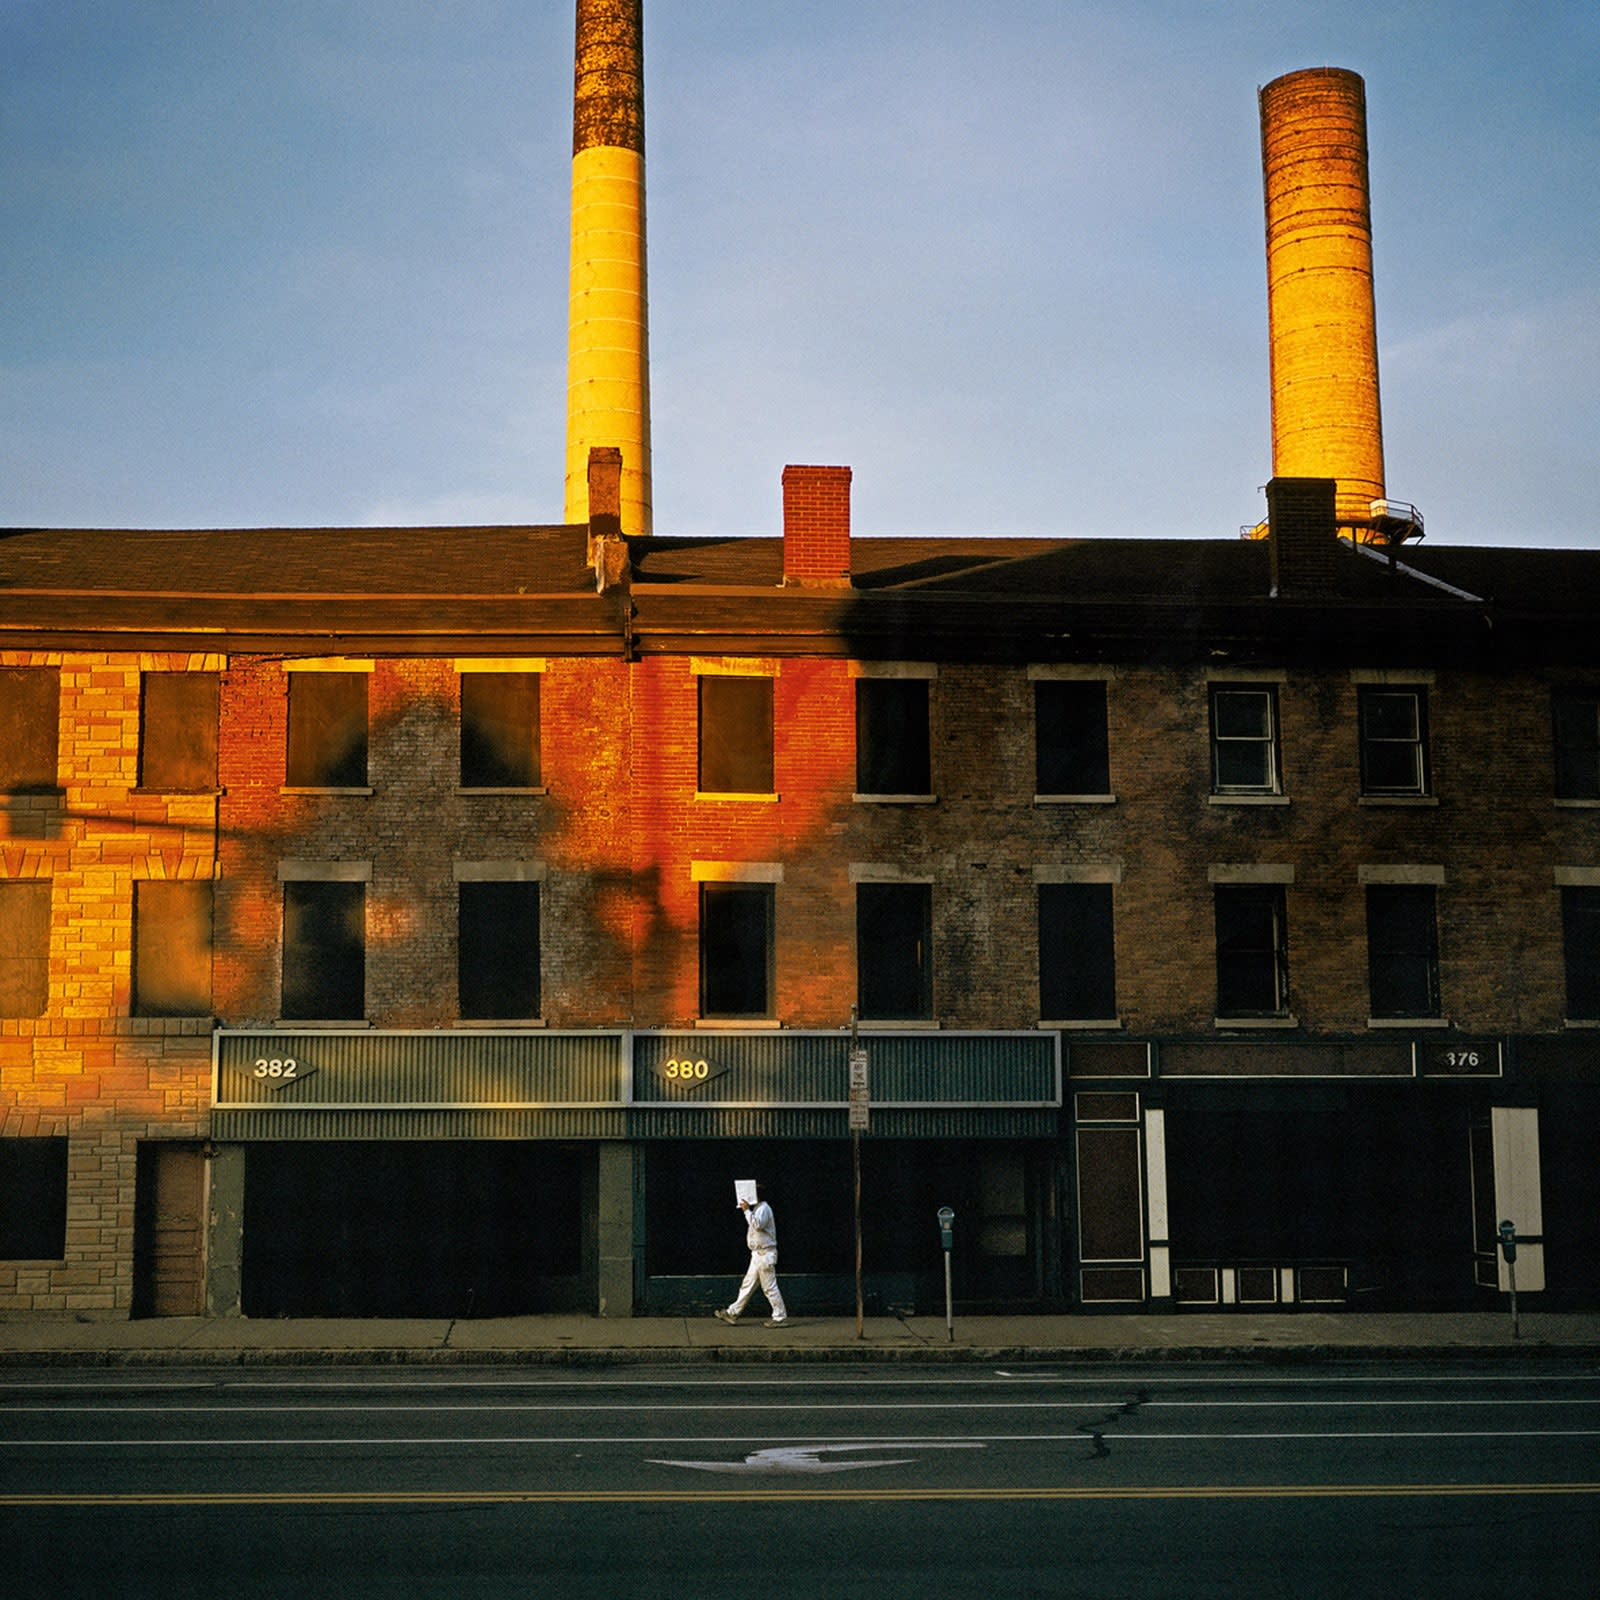 Jean-Christophe Béchet Kodak City, Rochester, NY Tirage Ilfochrome (Cibachrome) Dim. papier: 40 x 50 cm